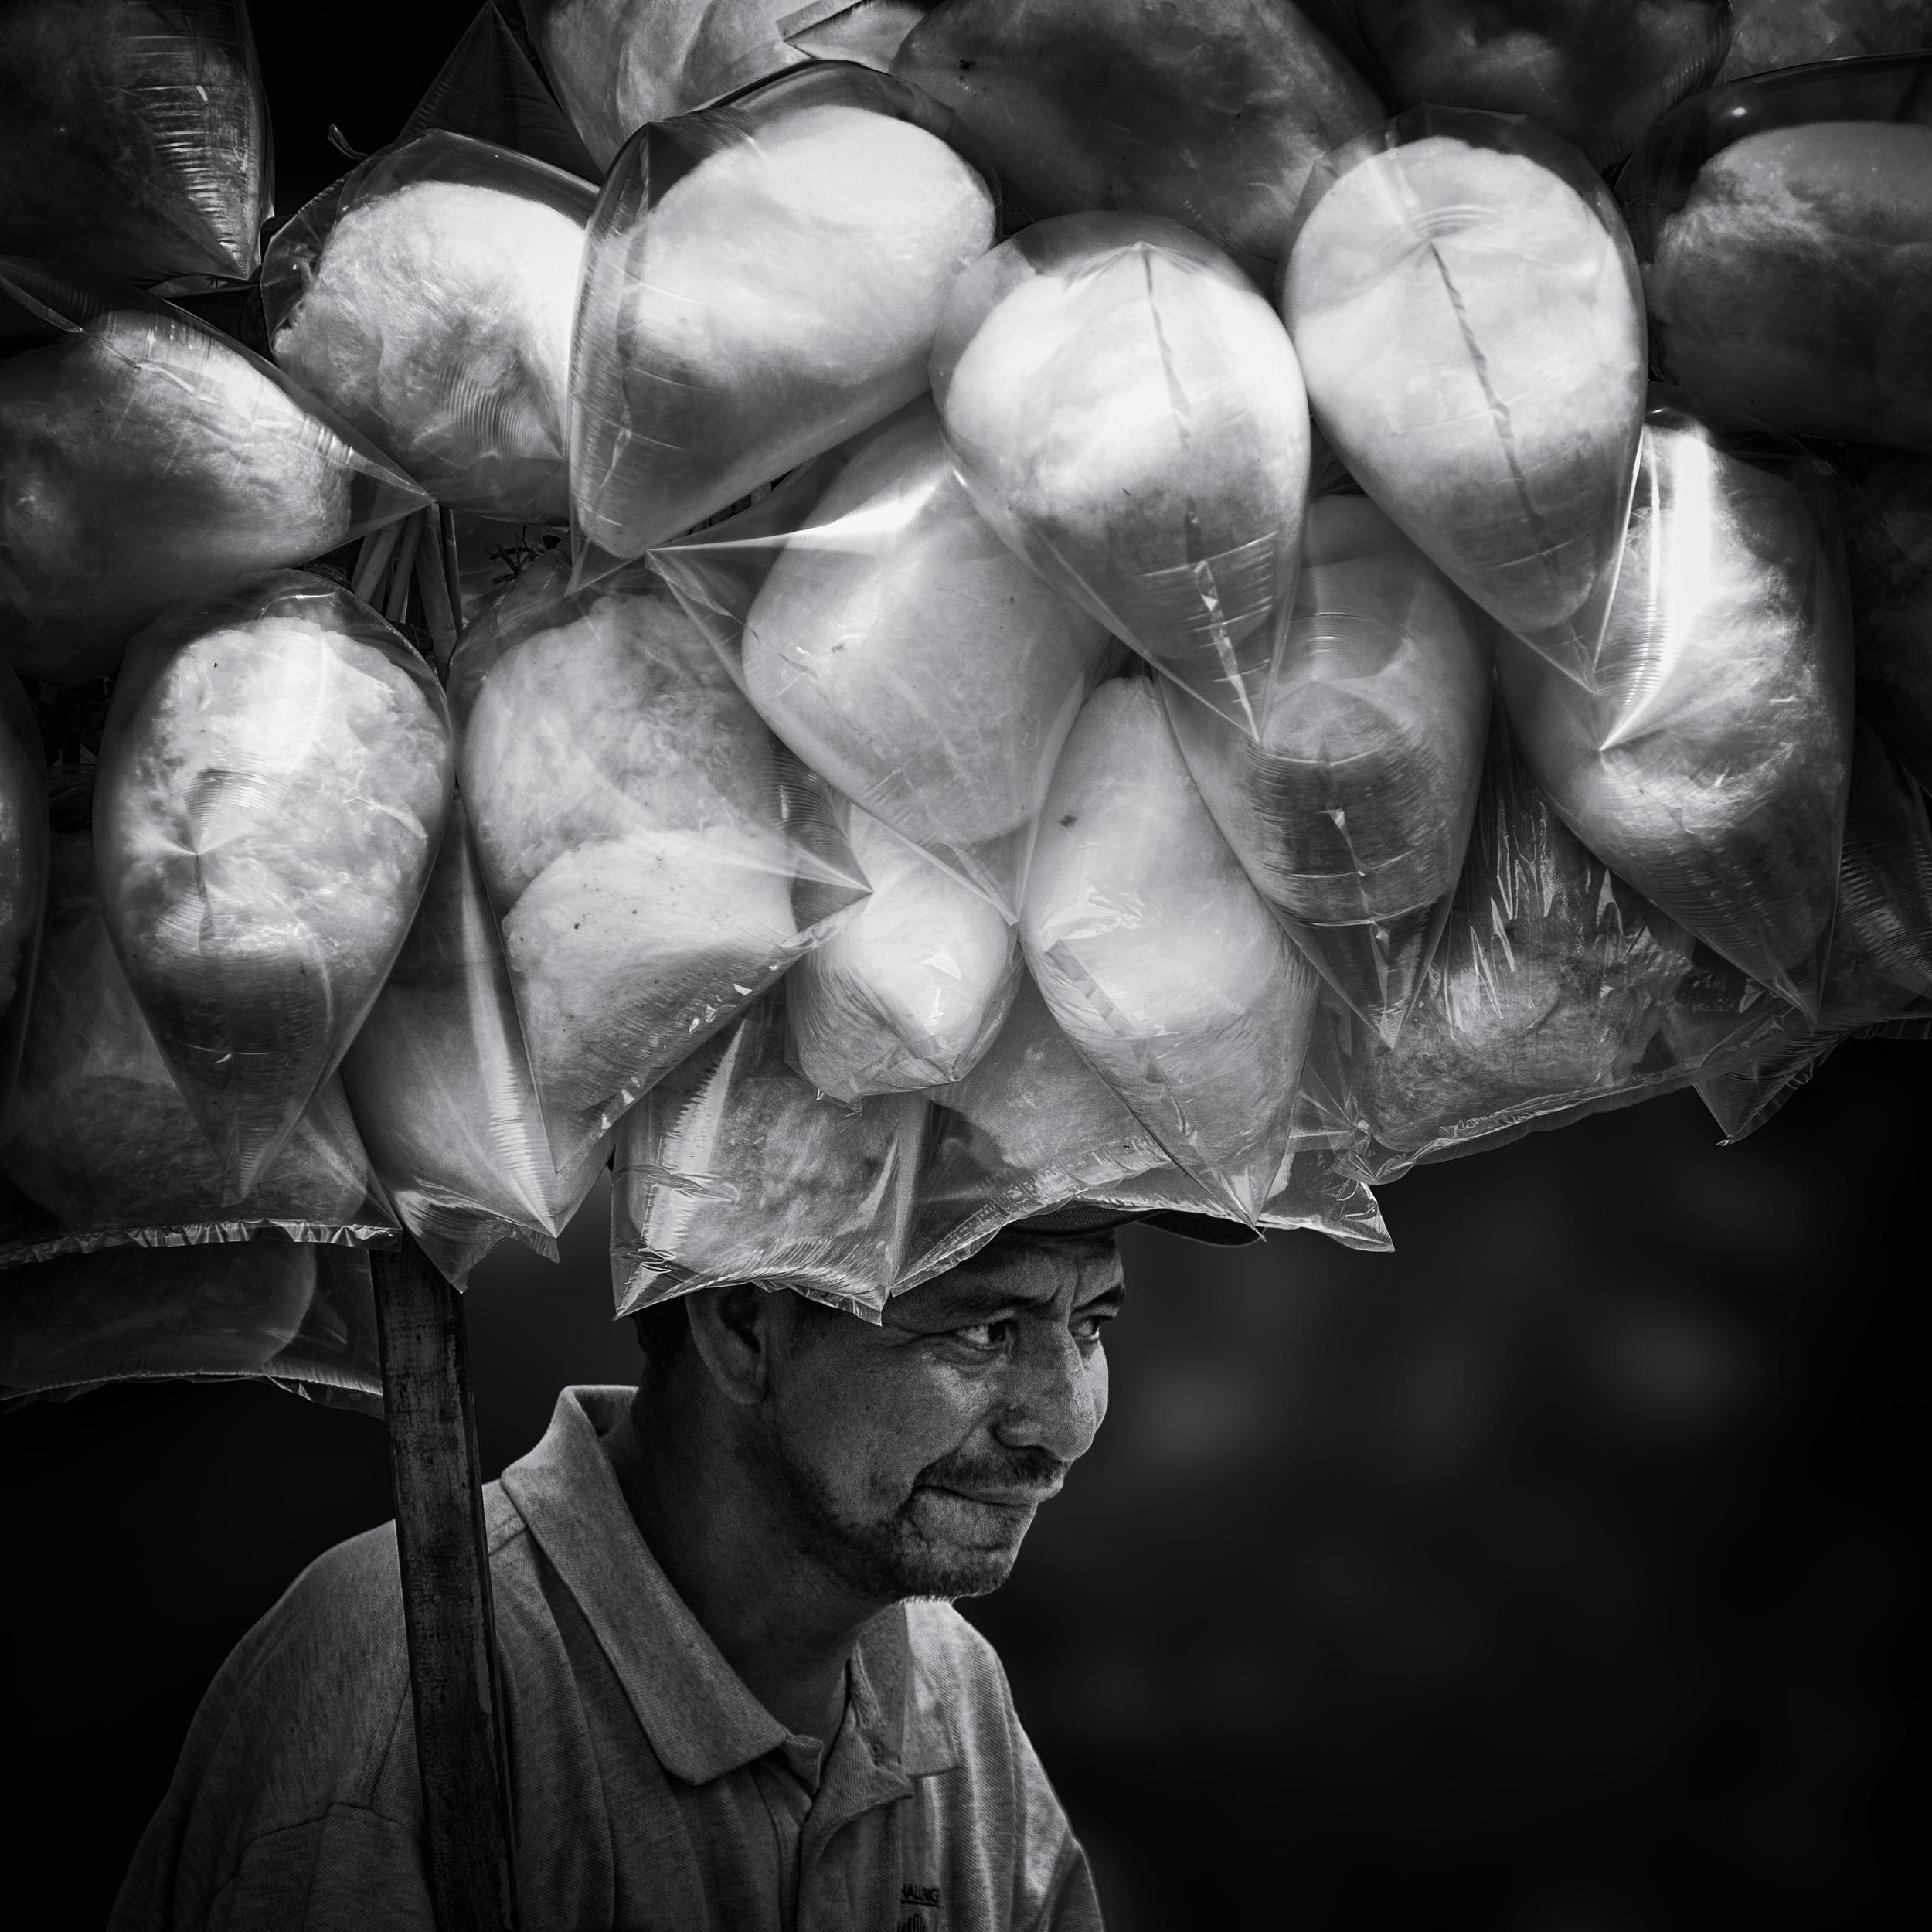 cotton candy salesman